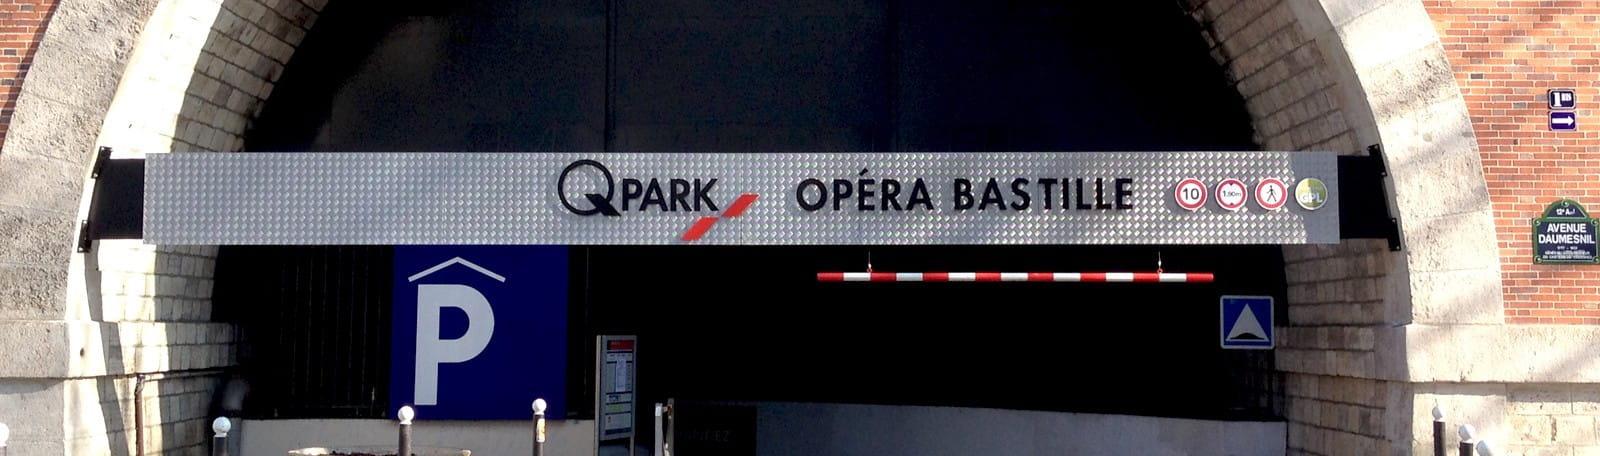 Q-Park Opéra Bastille